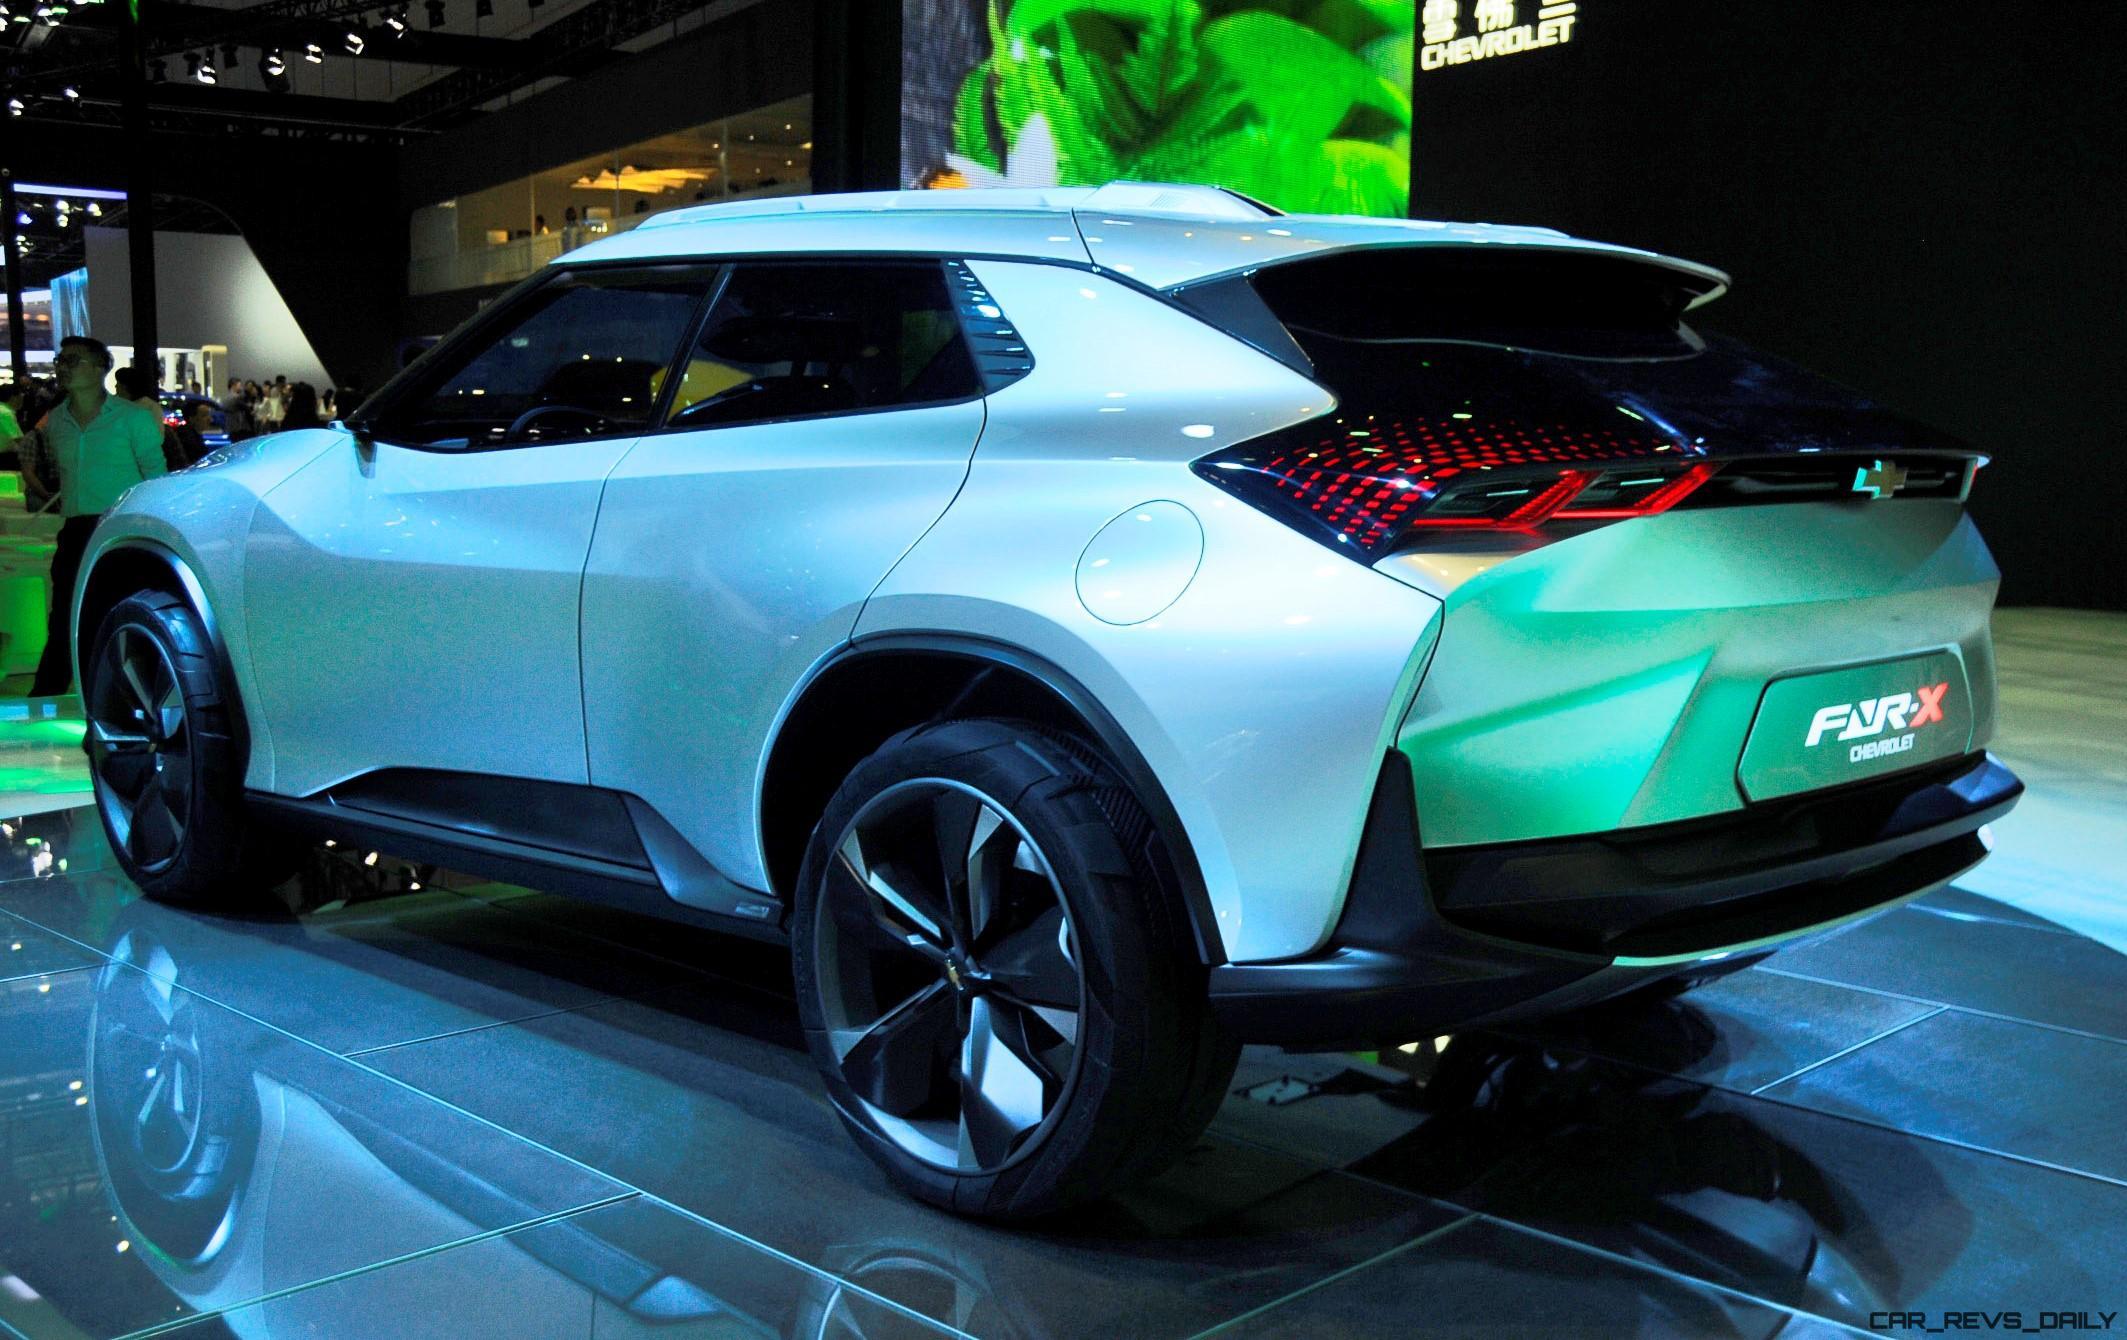 Best Of Shanghai 2017 Chevrolet Fnr X Concept 18 Photos The Electric Car